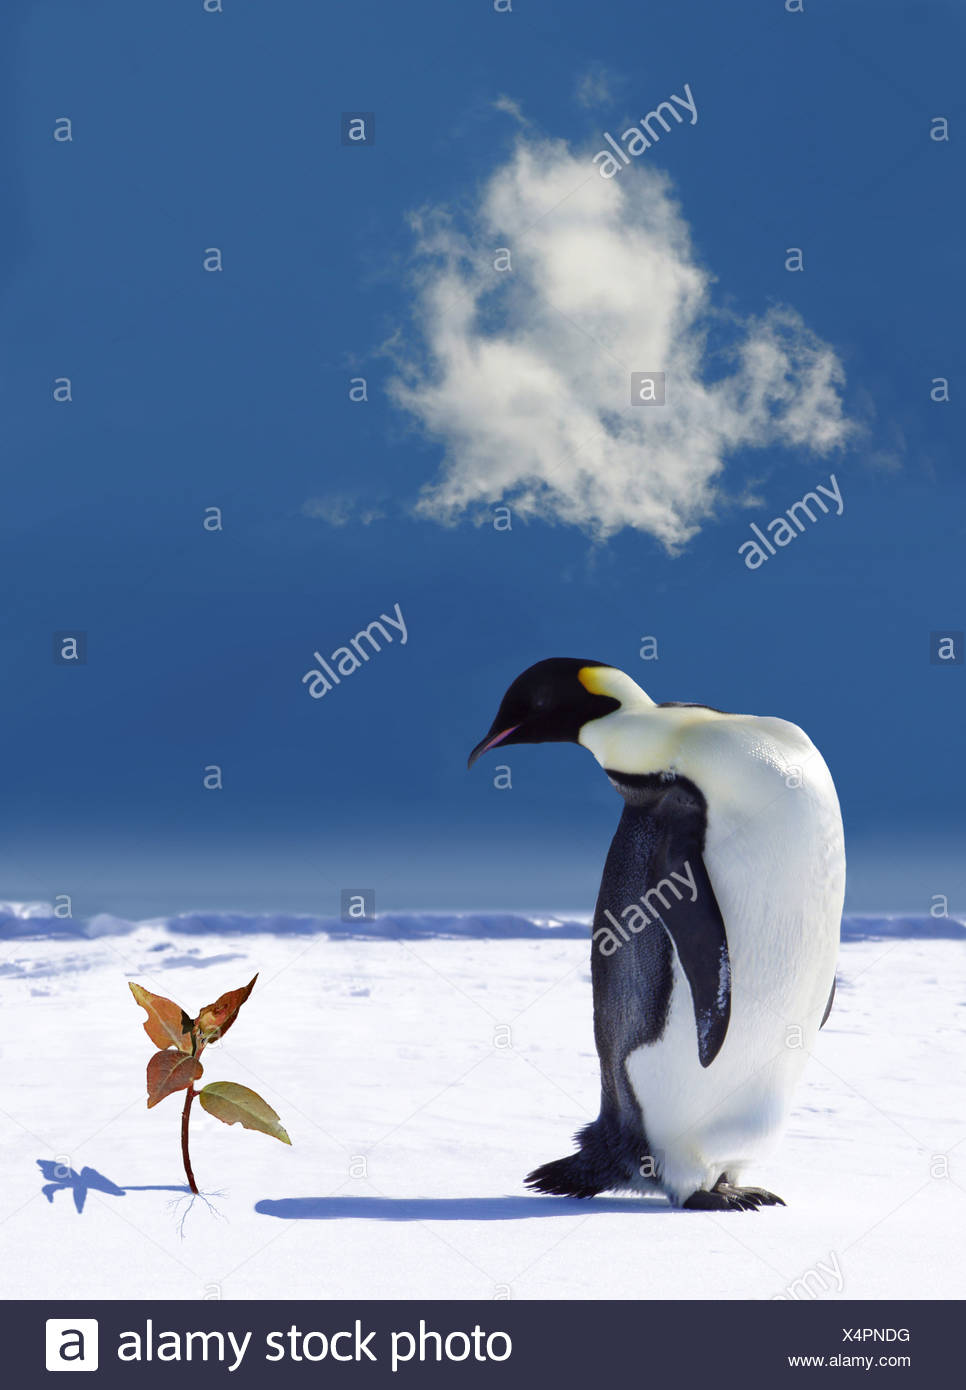 Global warming in Antarctica - Stock Image